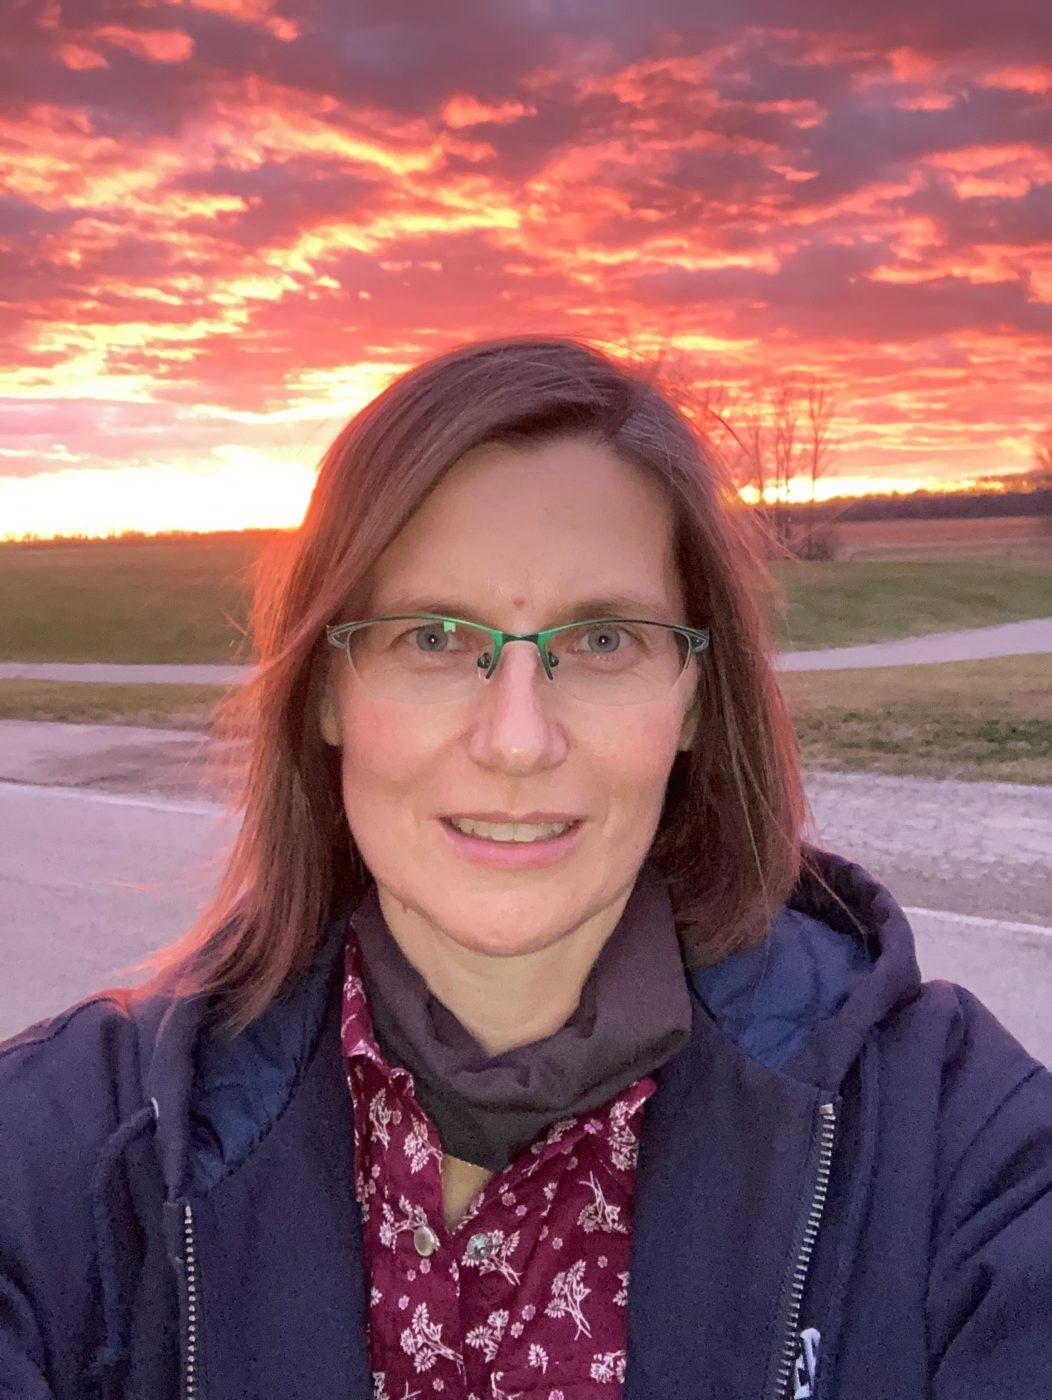 Carol Emmert is the Custodial Team Lead at Conner Prairie